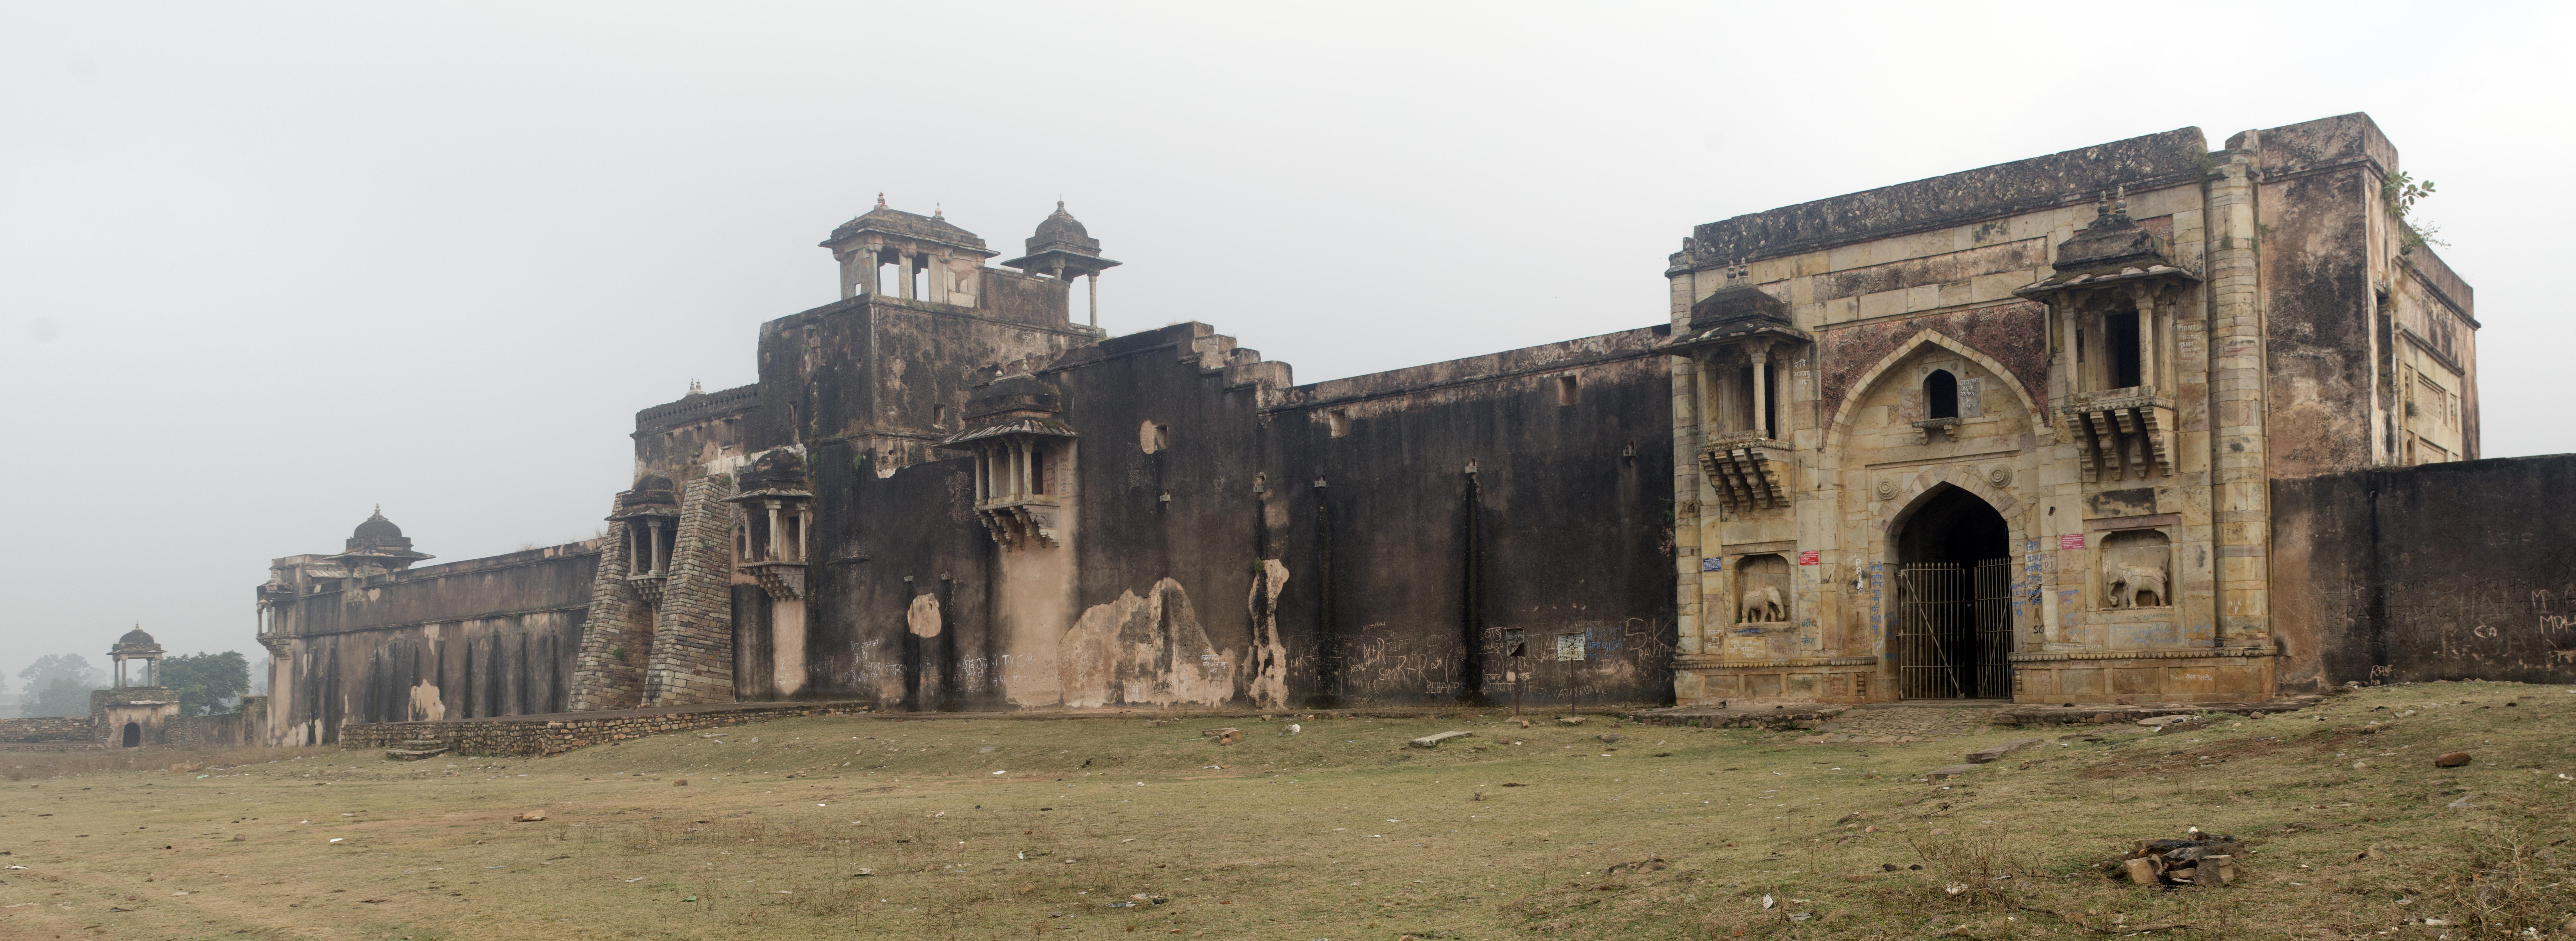 Rothasgarh Fort 43